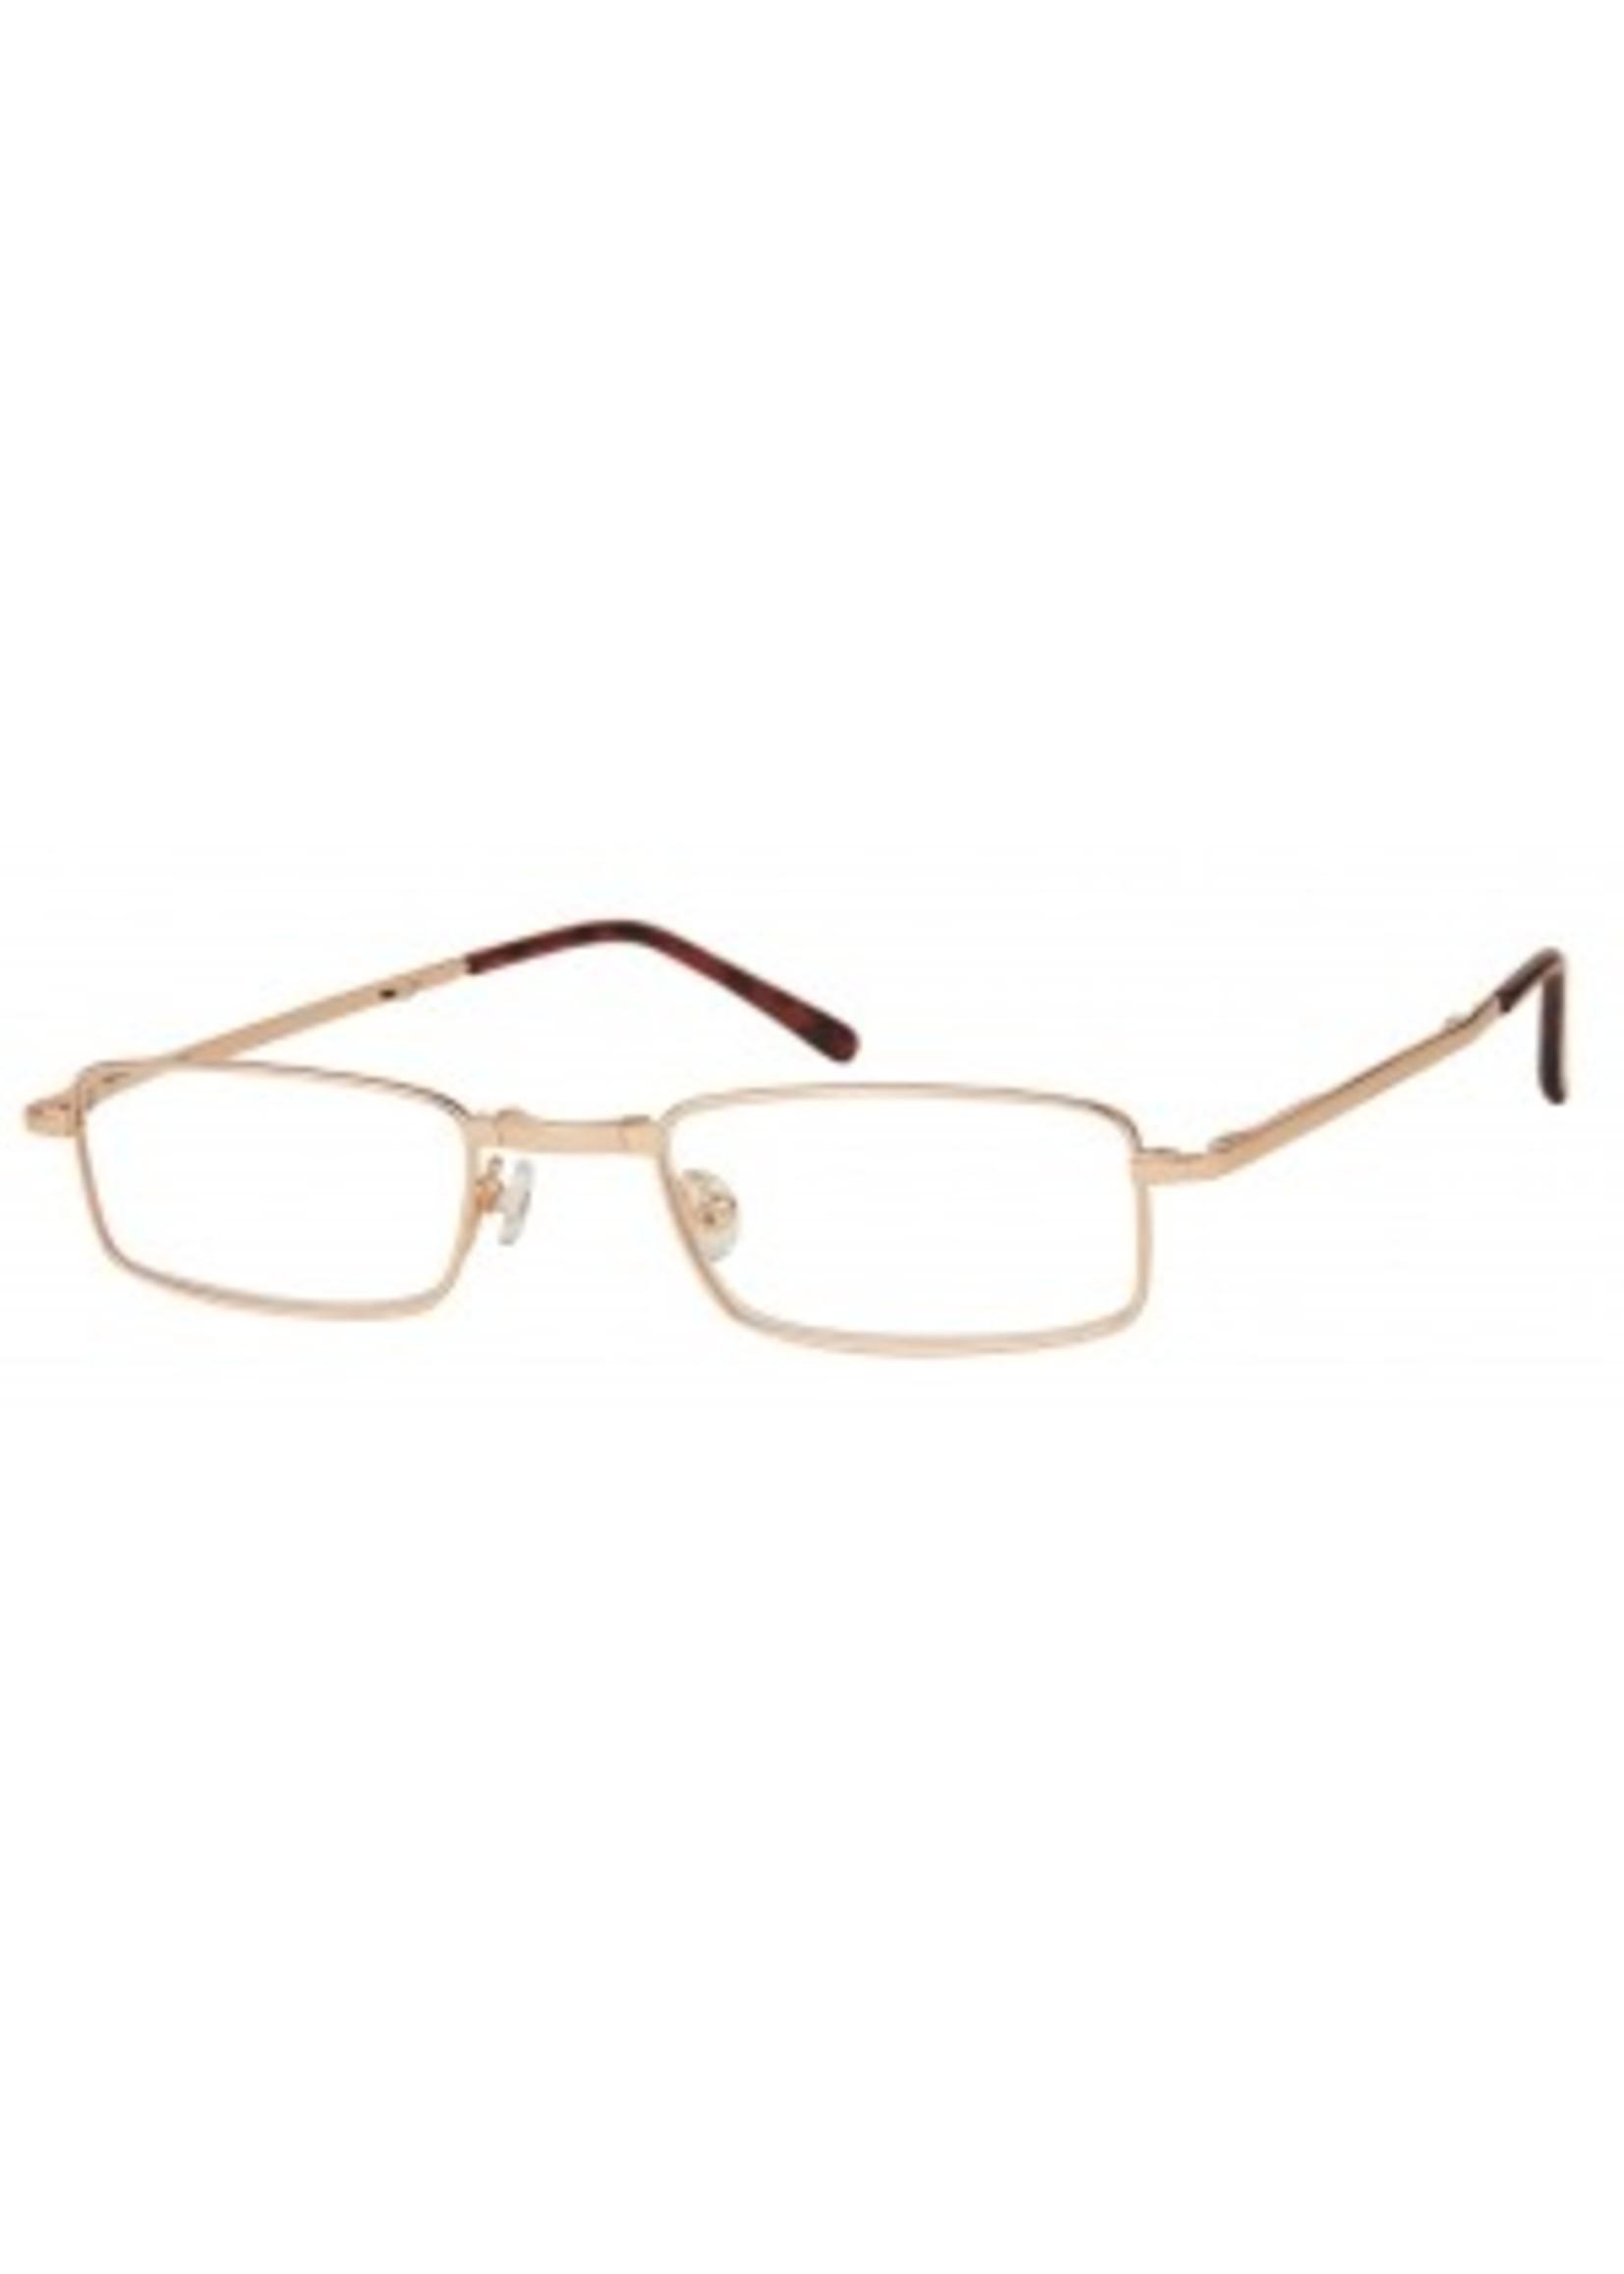 Opvouwbare leesbril in goudkleur